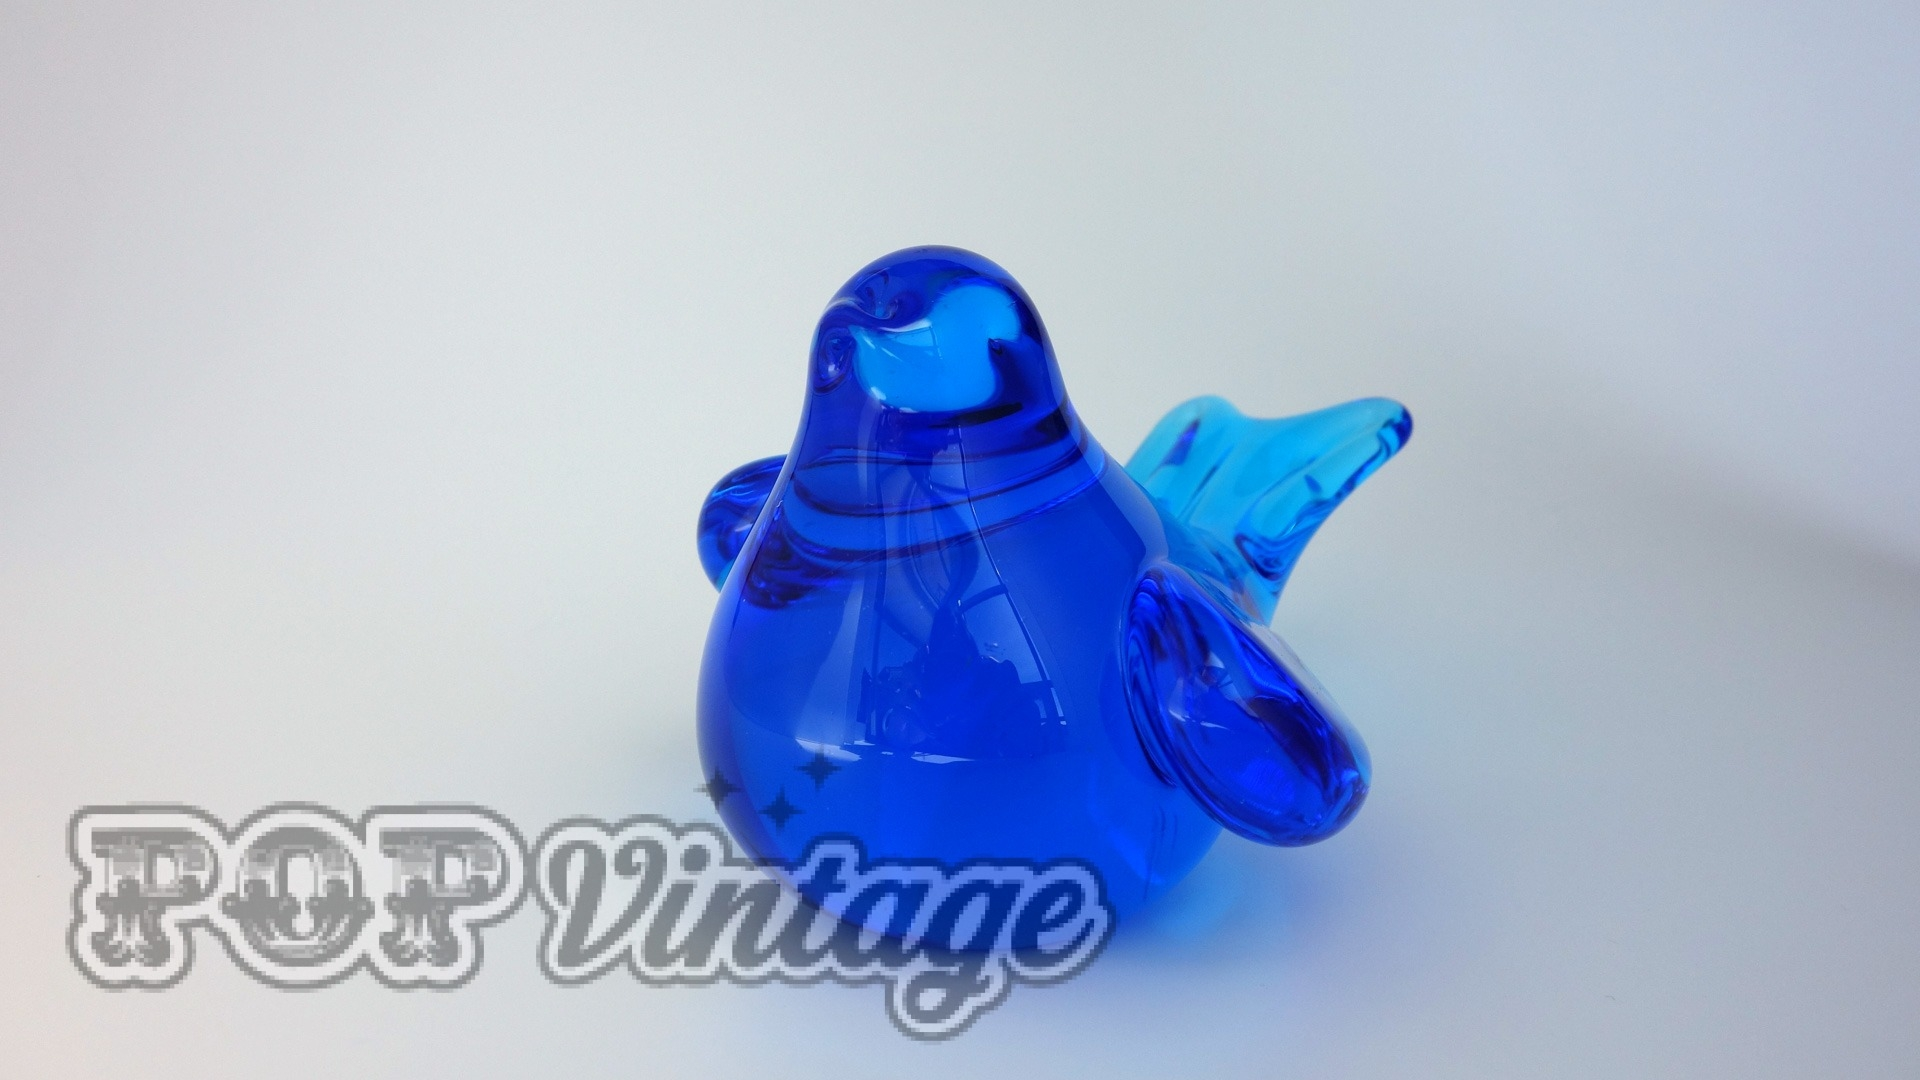 Glass Bluebird of Happiness